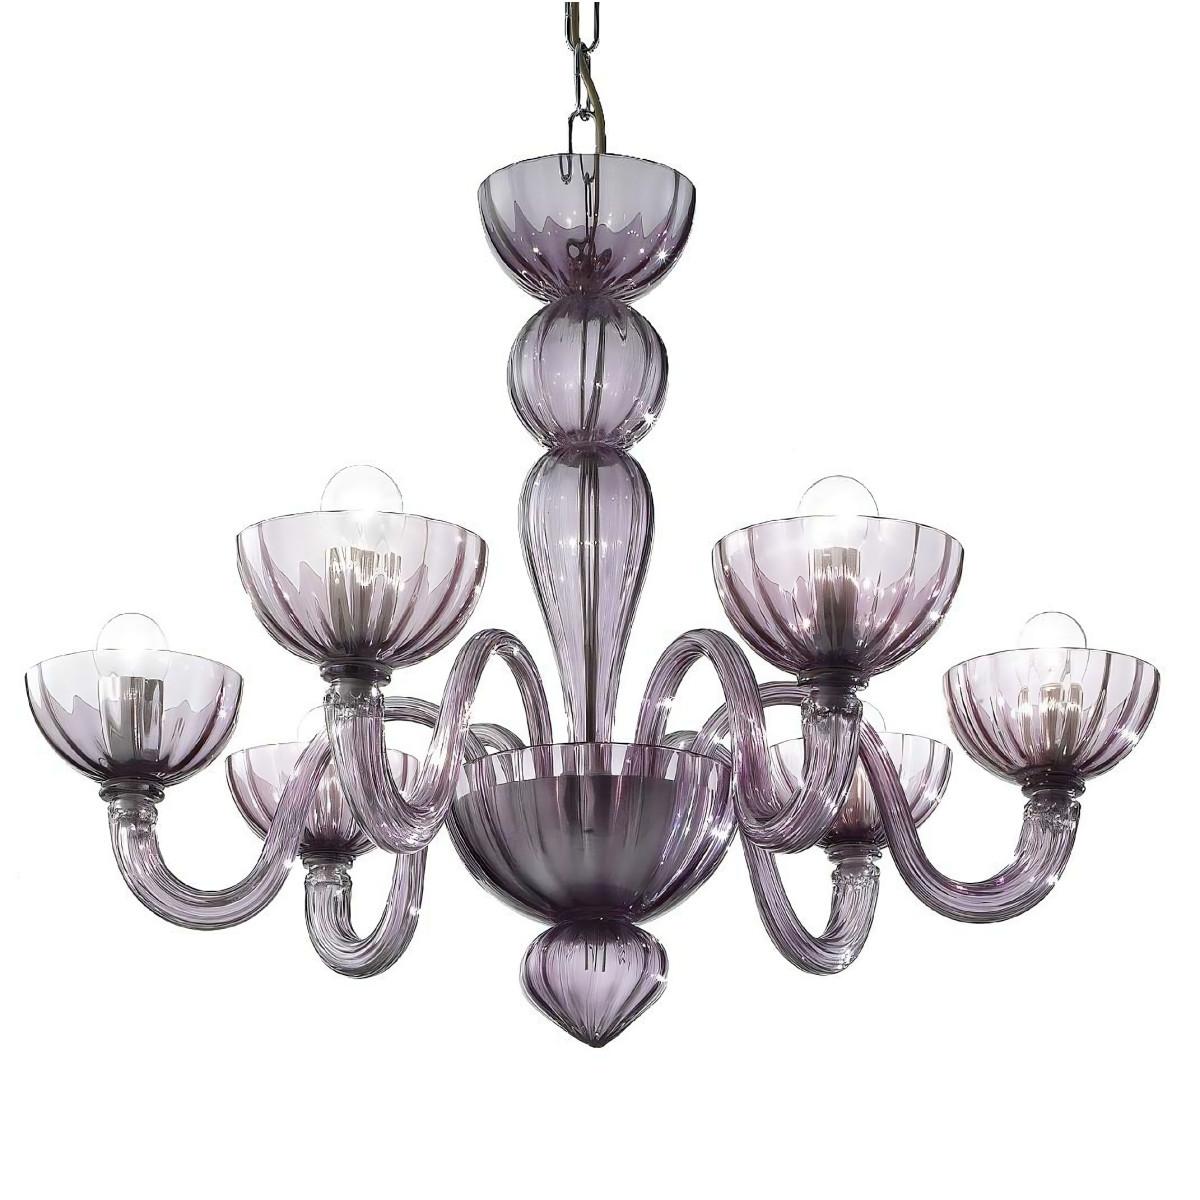 Redentore 6 lights Murano chandelier - amethyst color